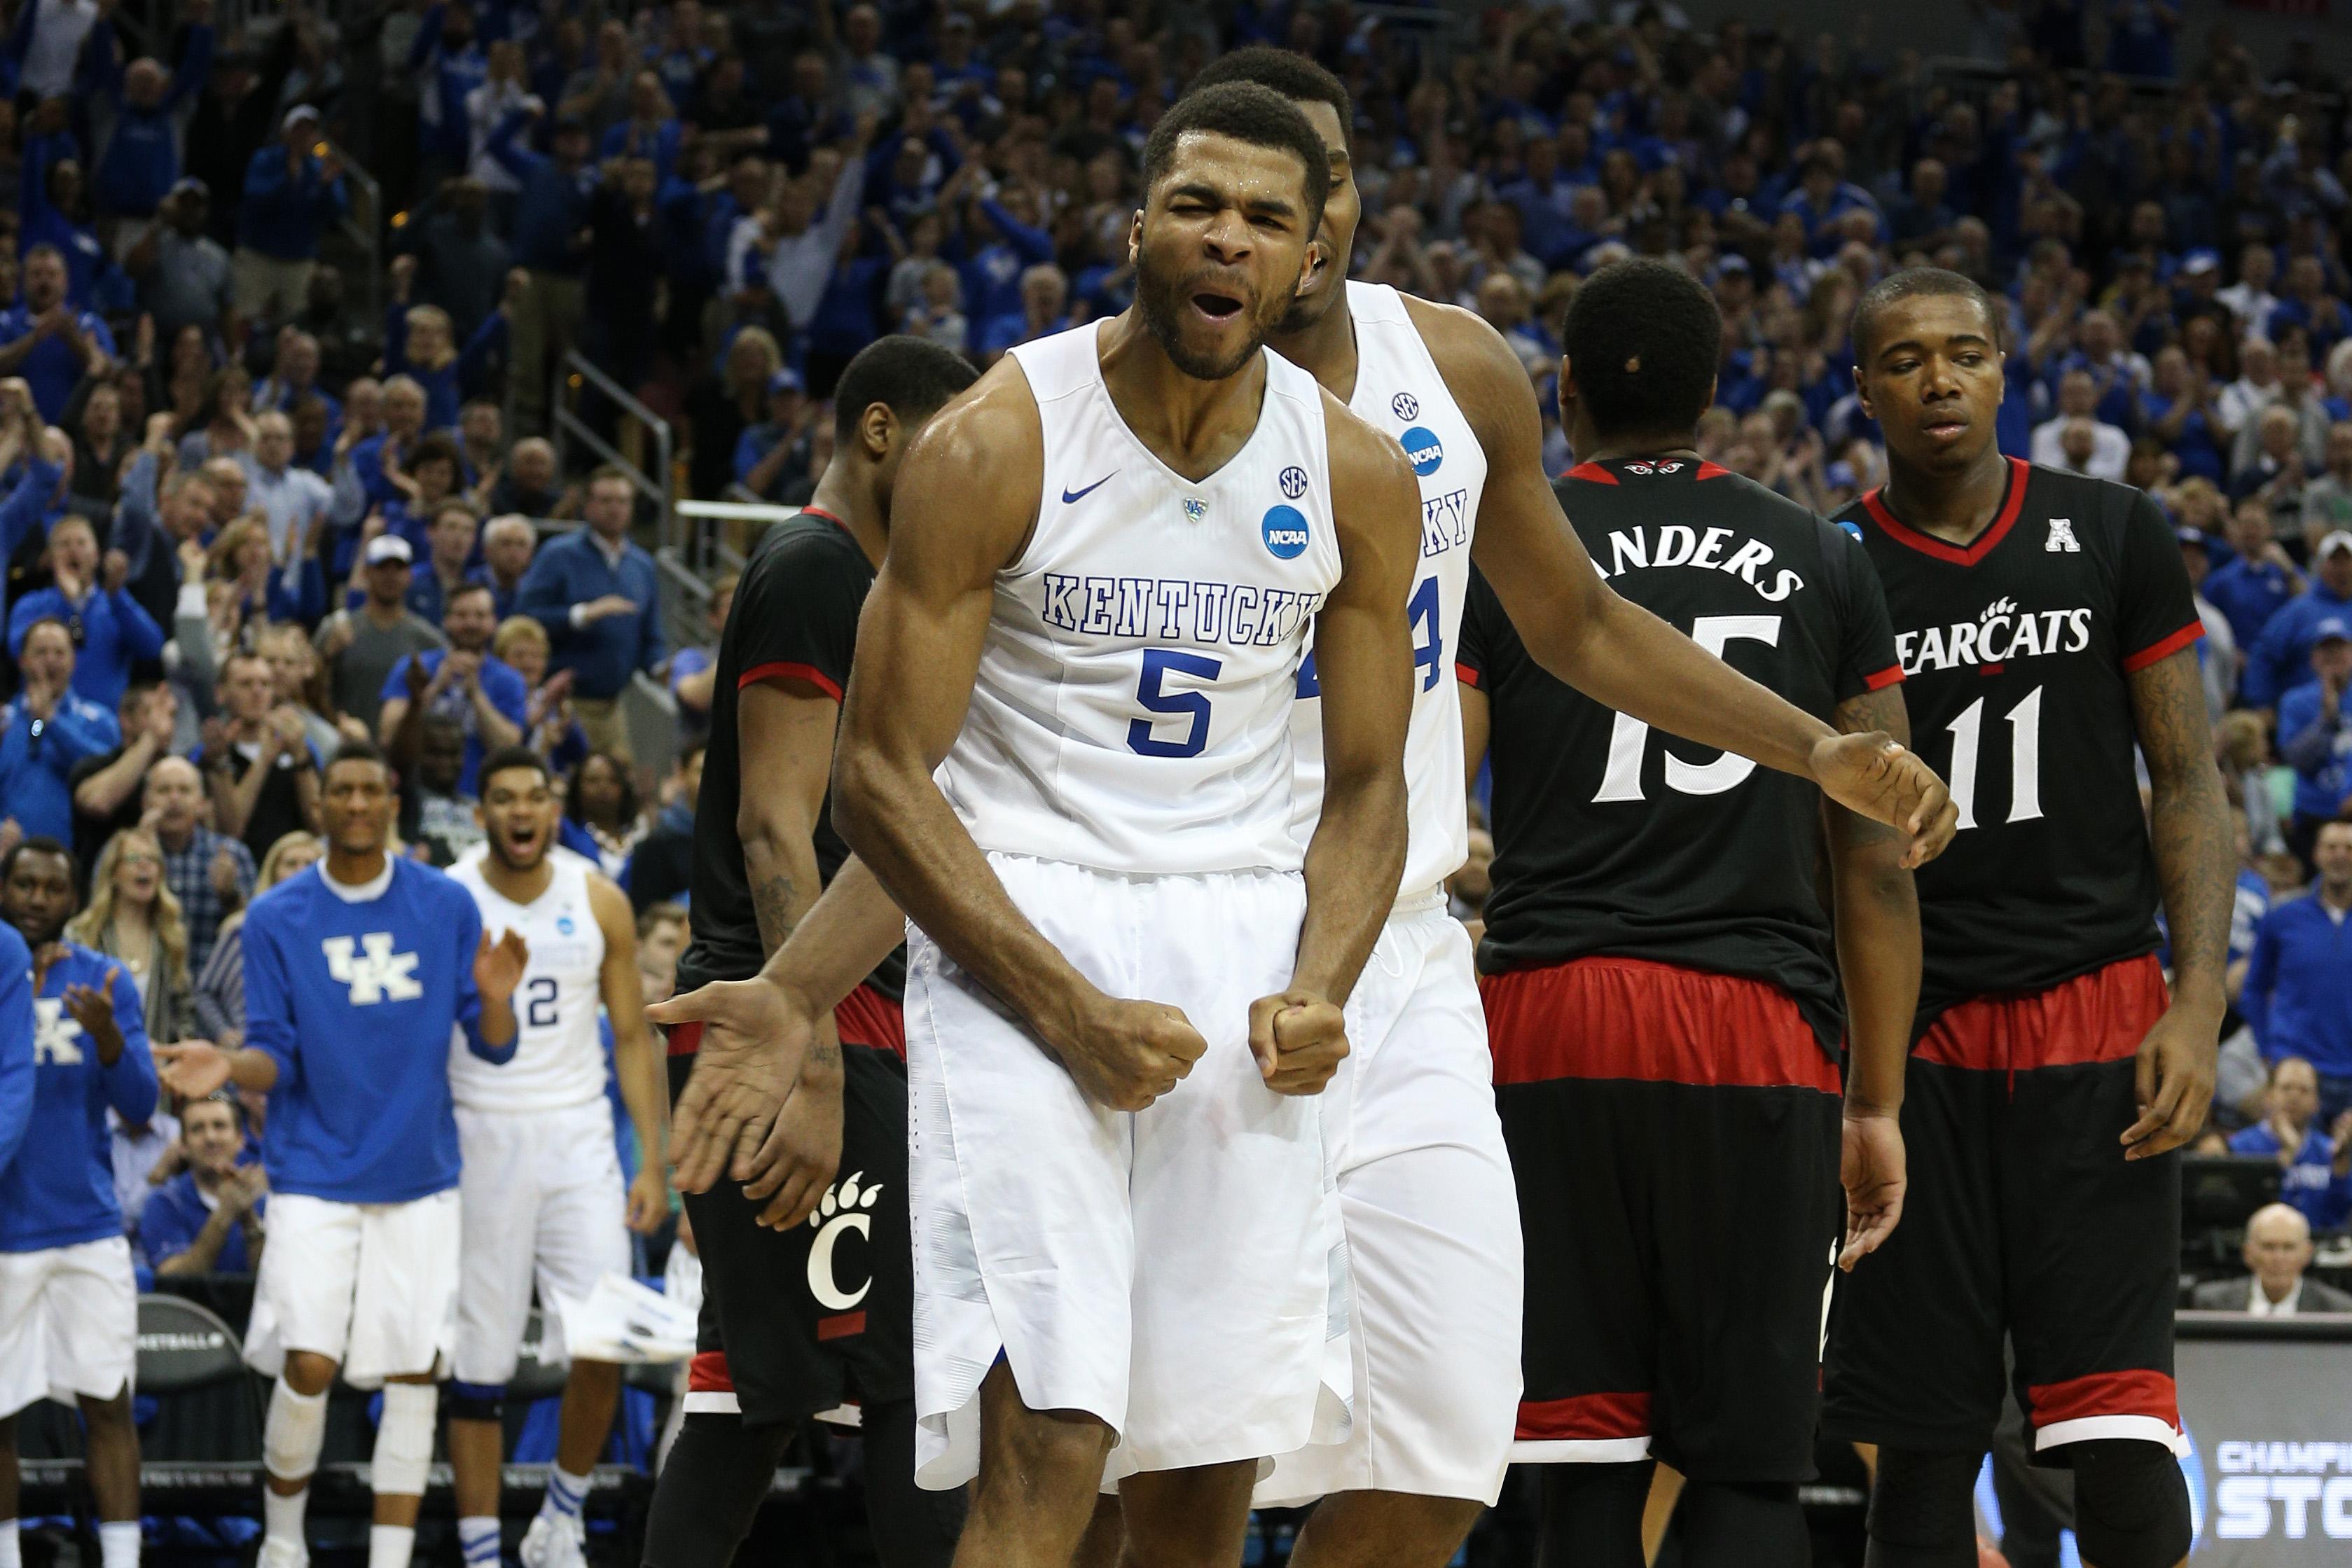 Kentucky Basketball: Ranking The Top Five Wildcats Players